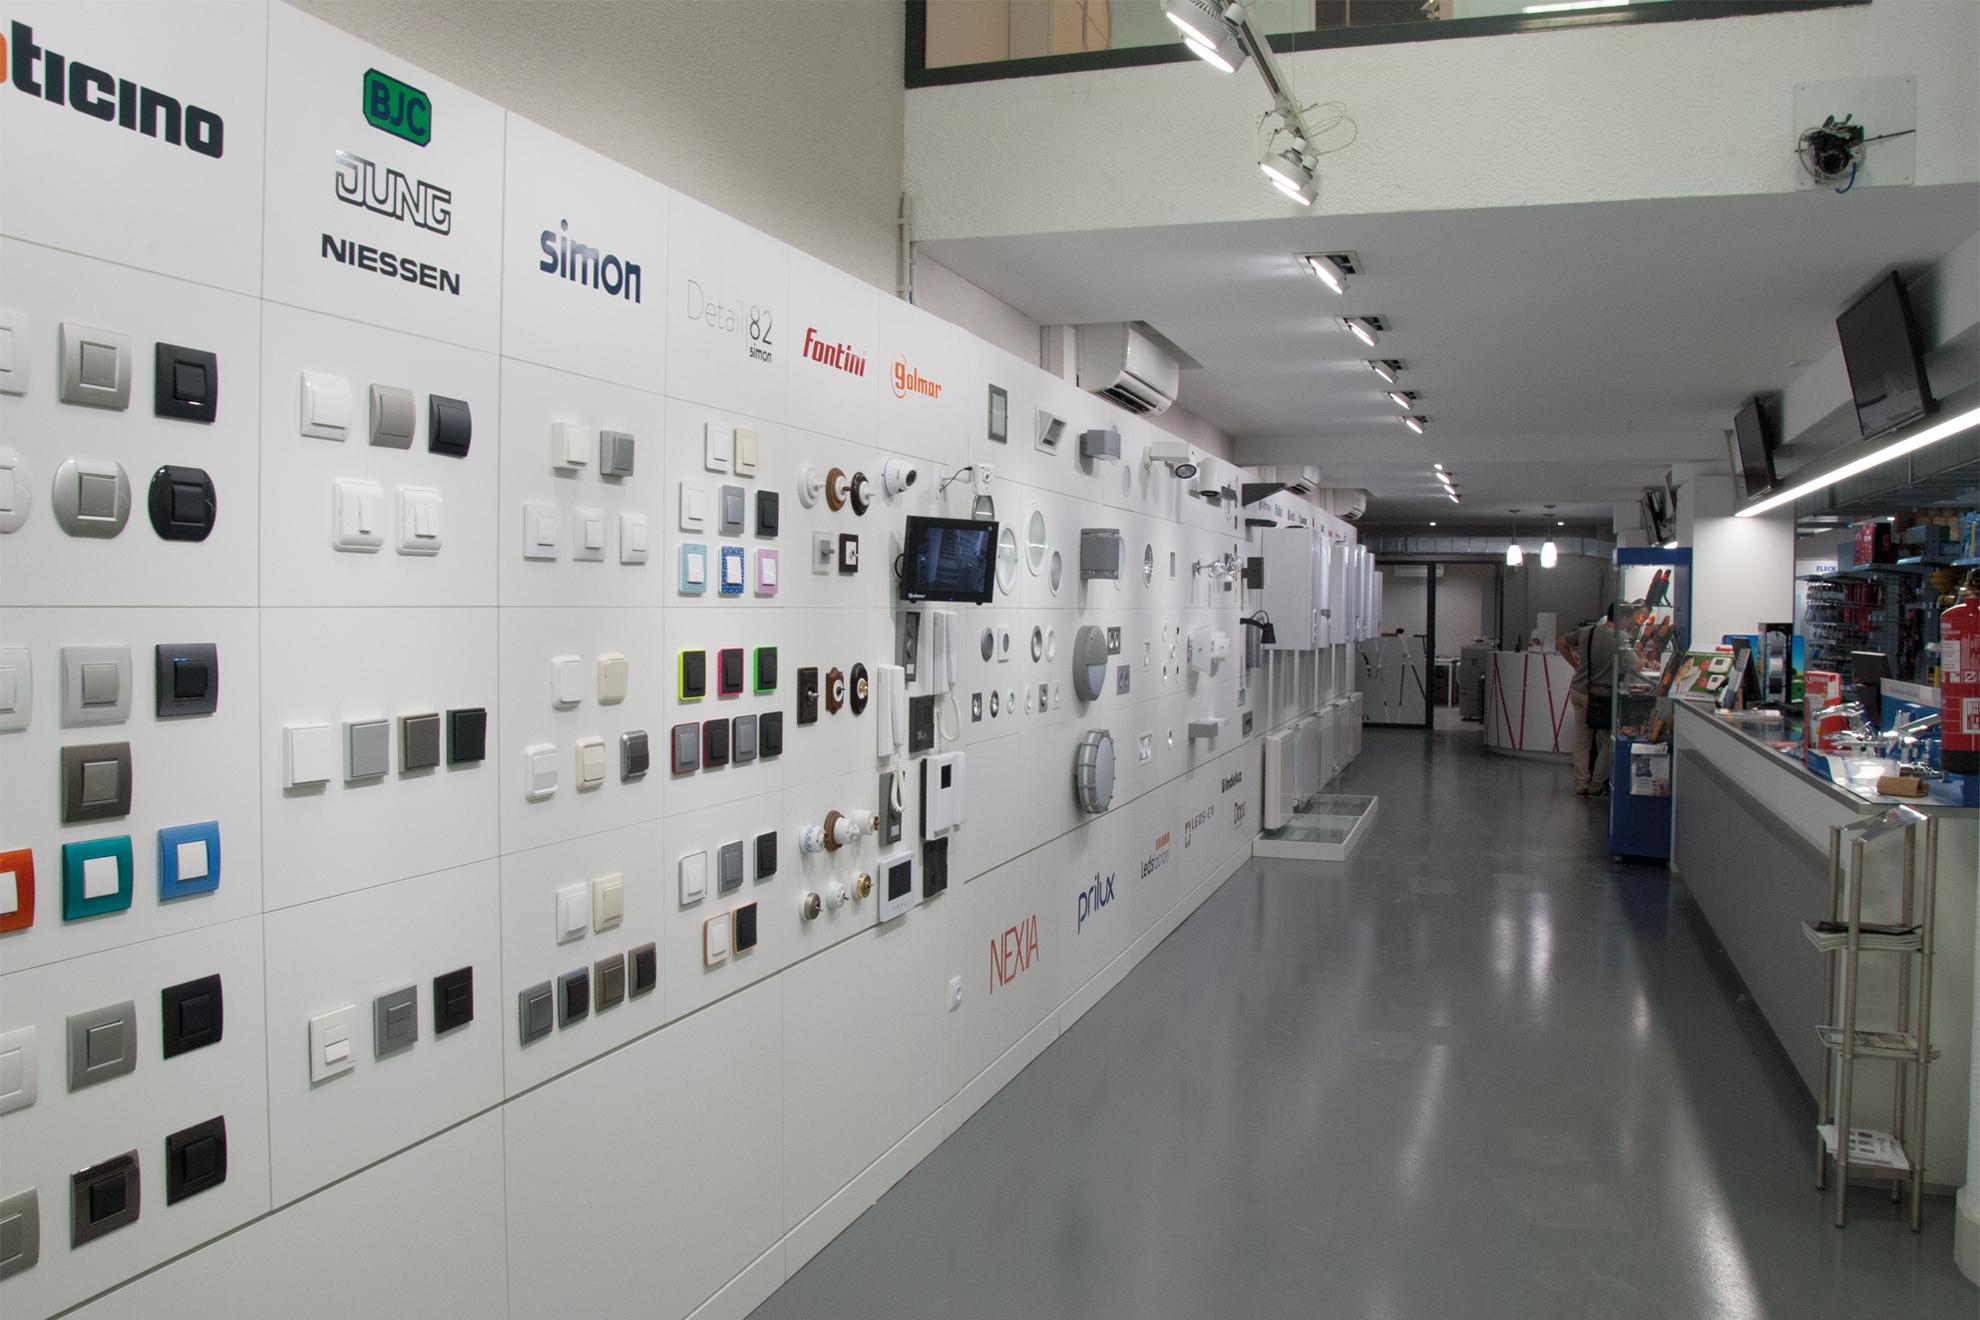 exposición industrial fontgas vilamarí